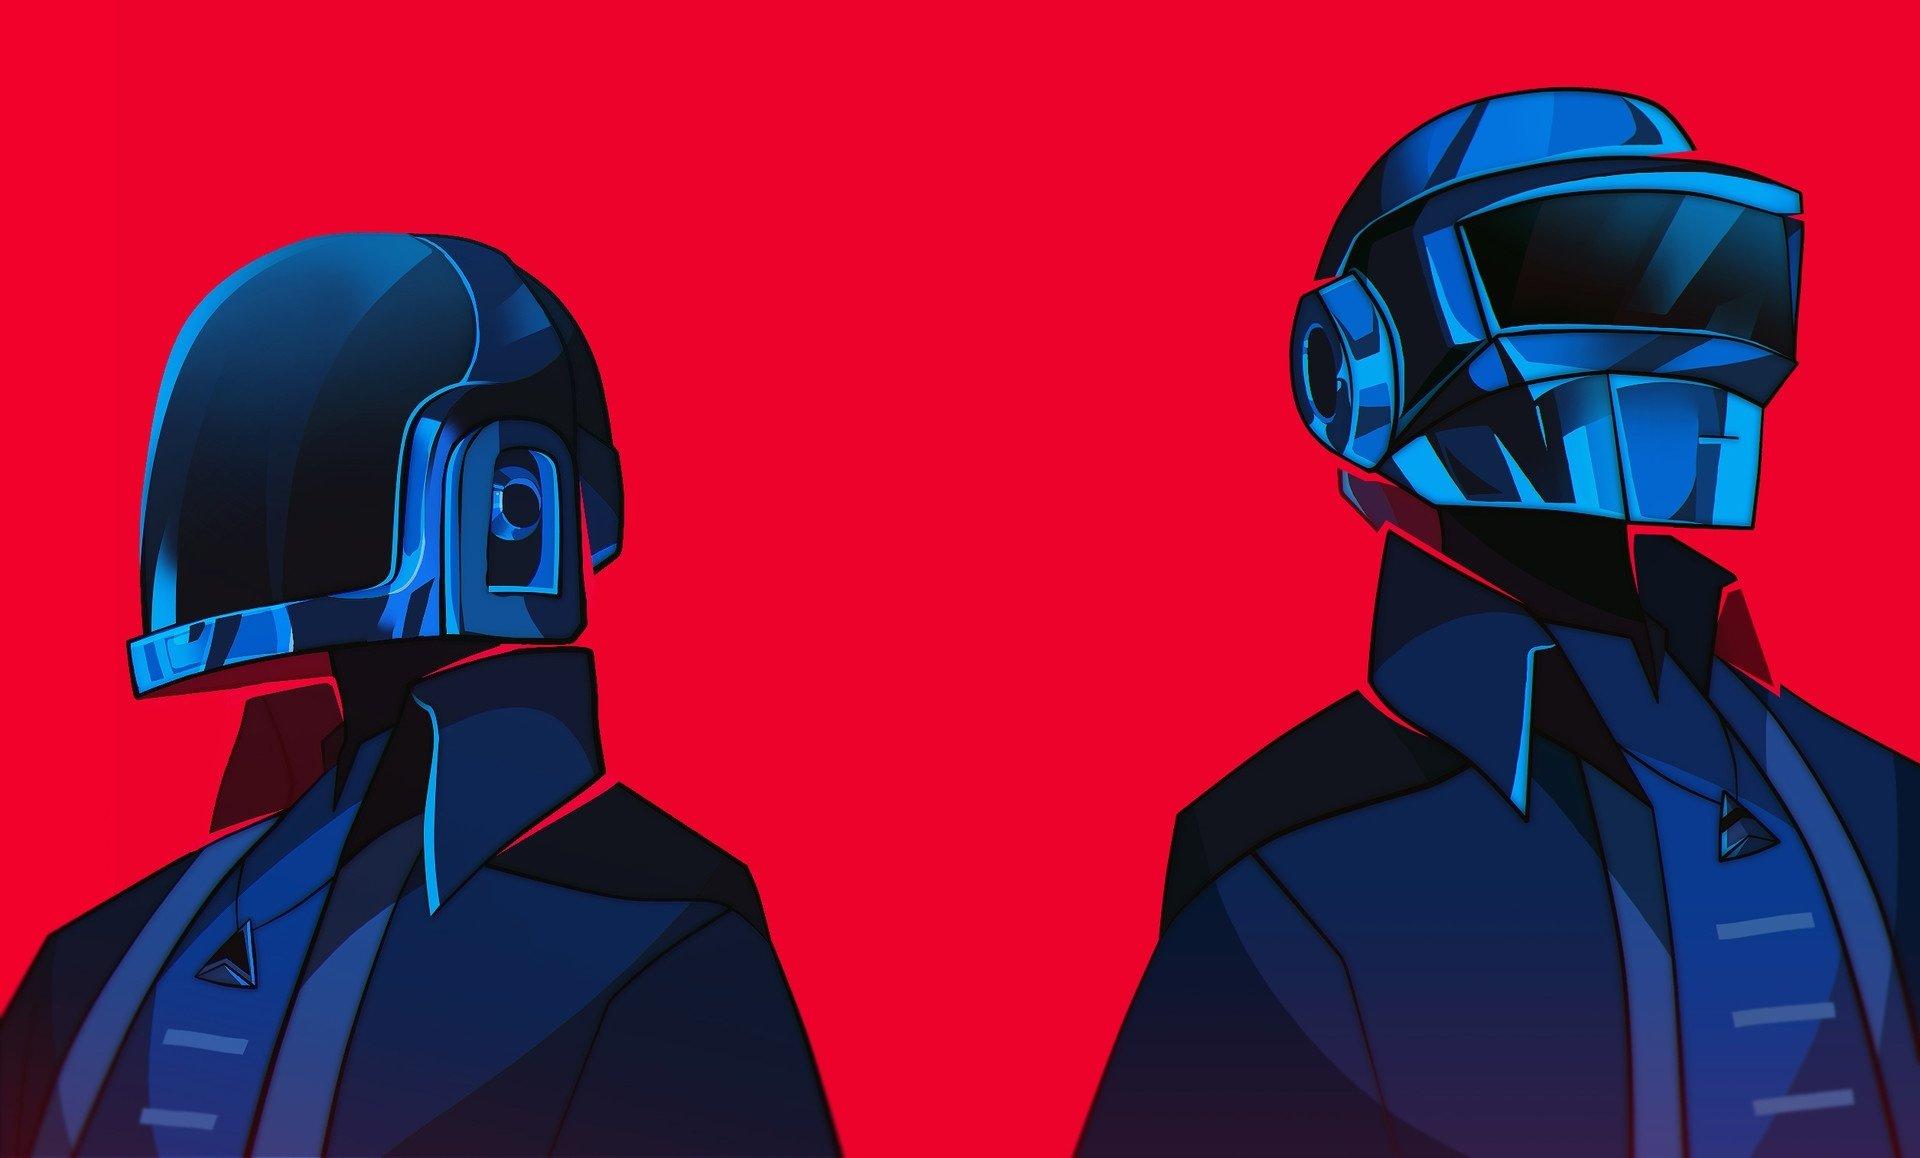 Daft Punk HD Wallpaper | Background Image | 1920x1158 | ID ...